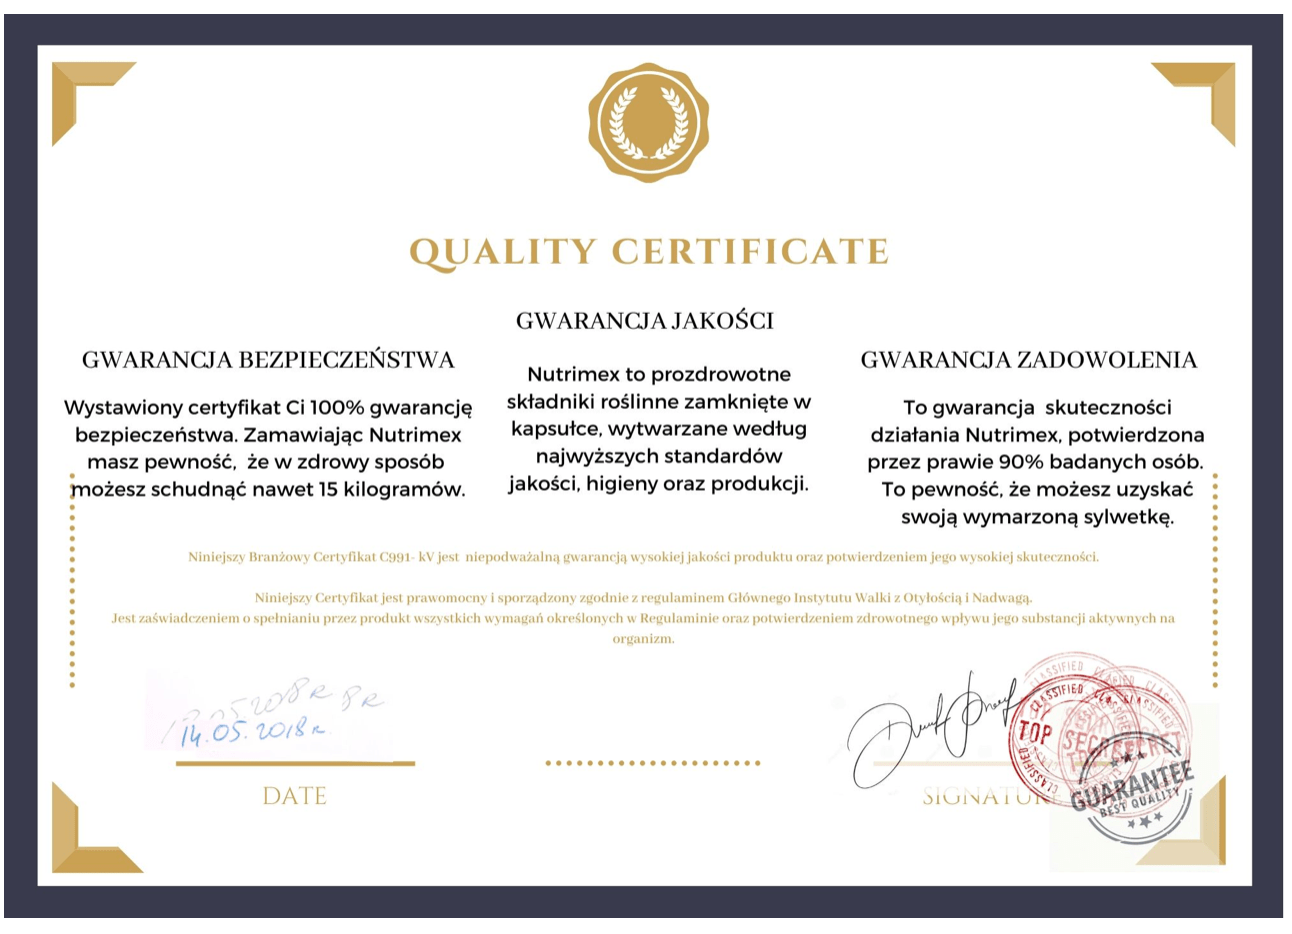 Falszywy certyfikat